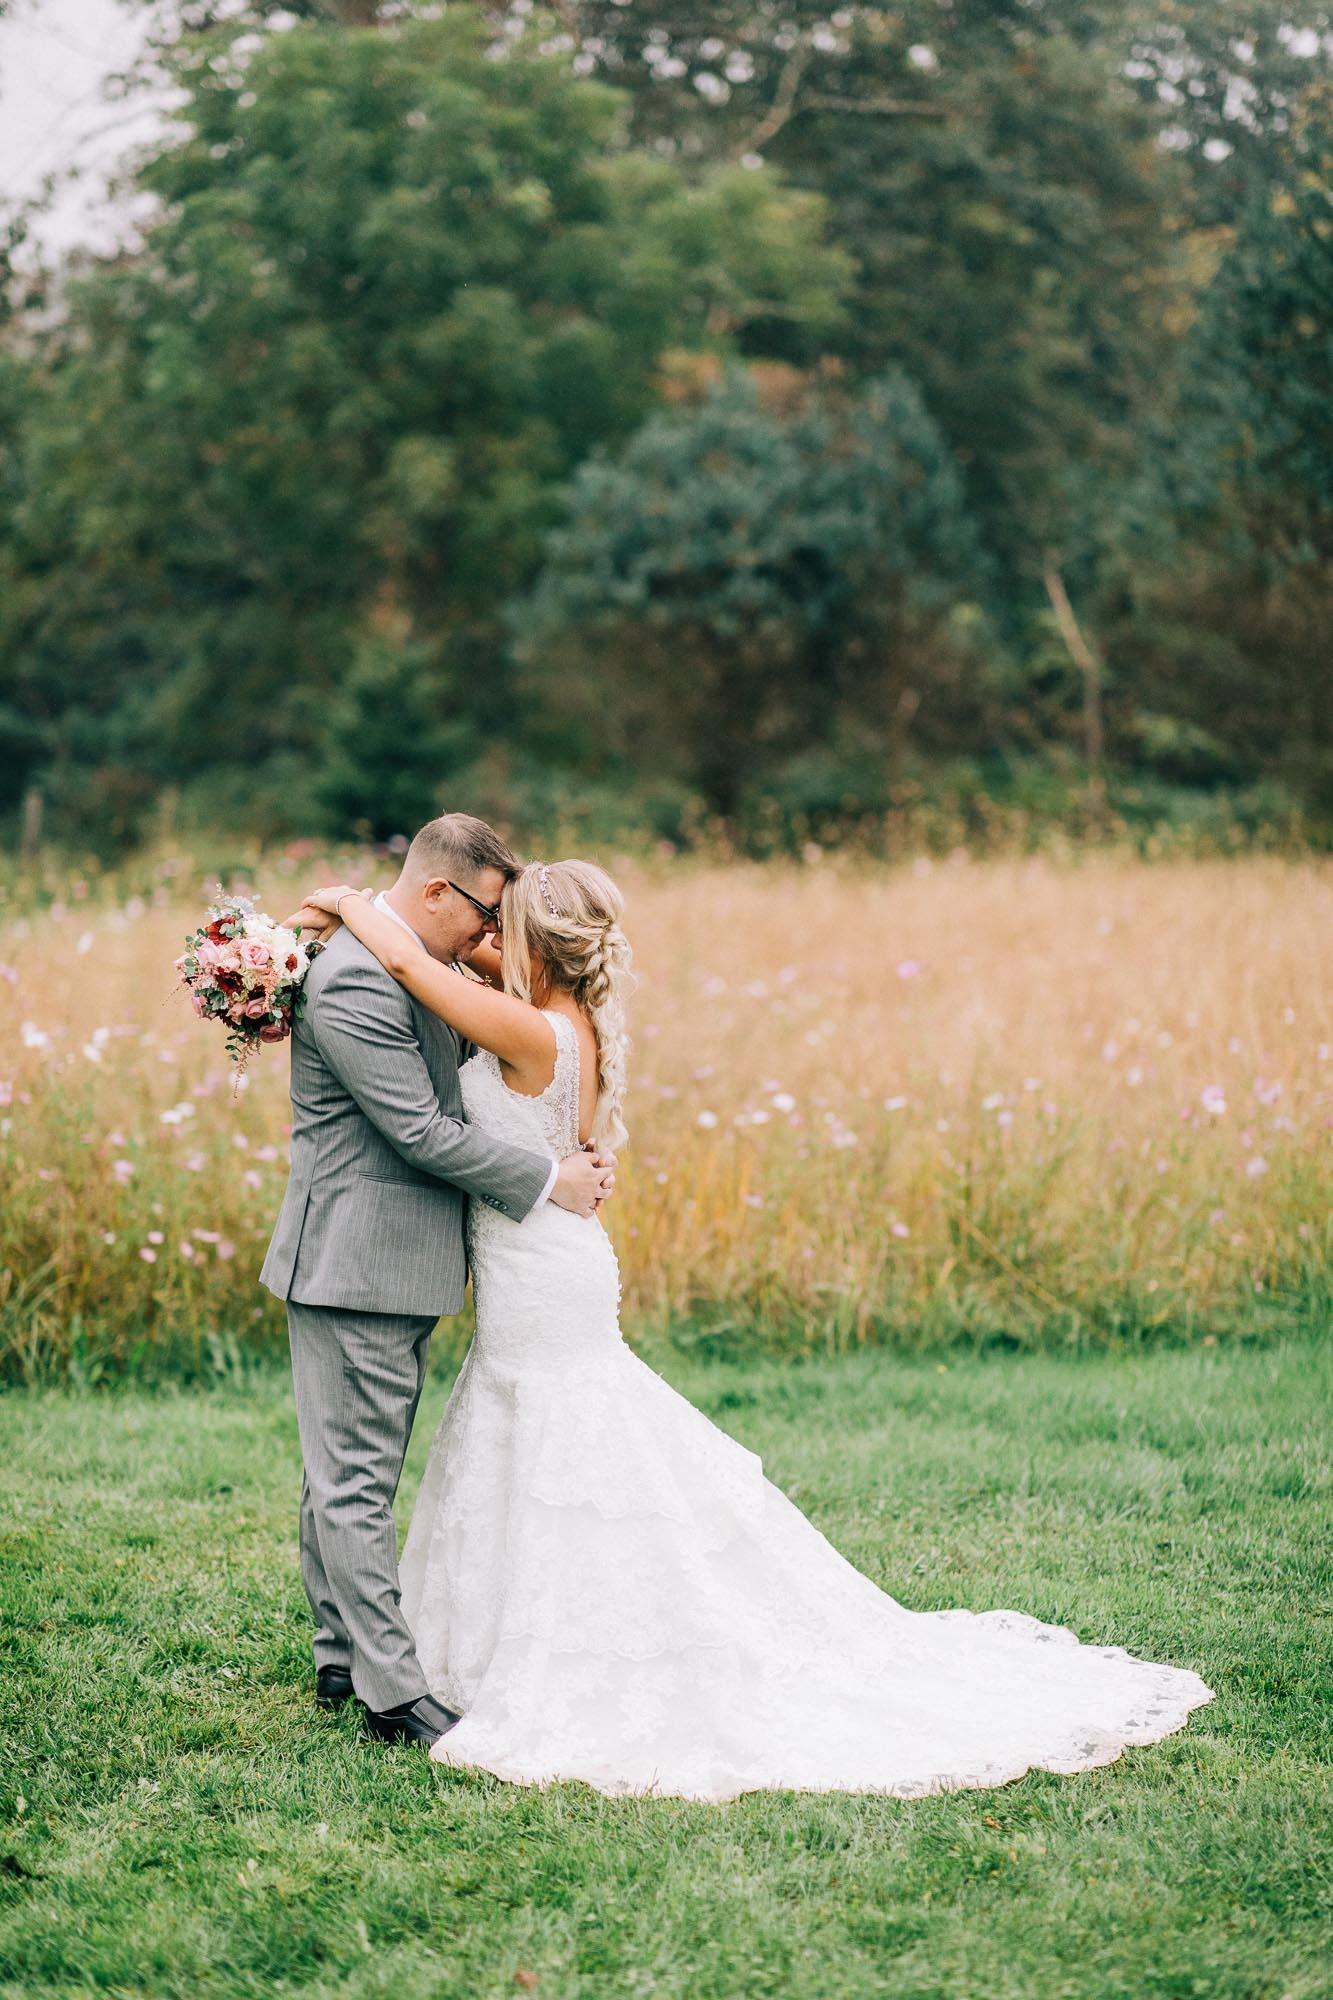 Lodge-at-Raven-Creek-October-wedding-61.jpg